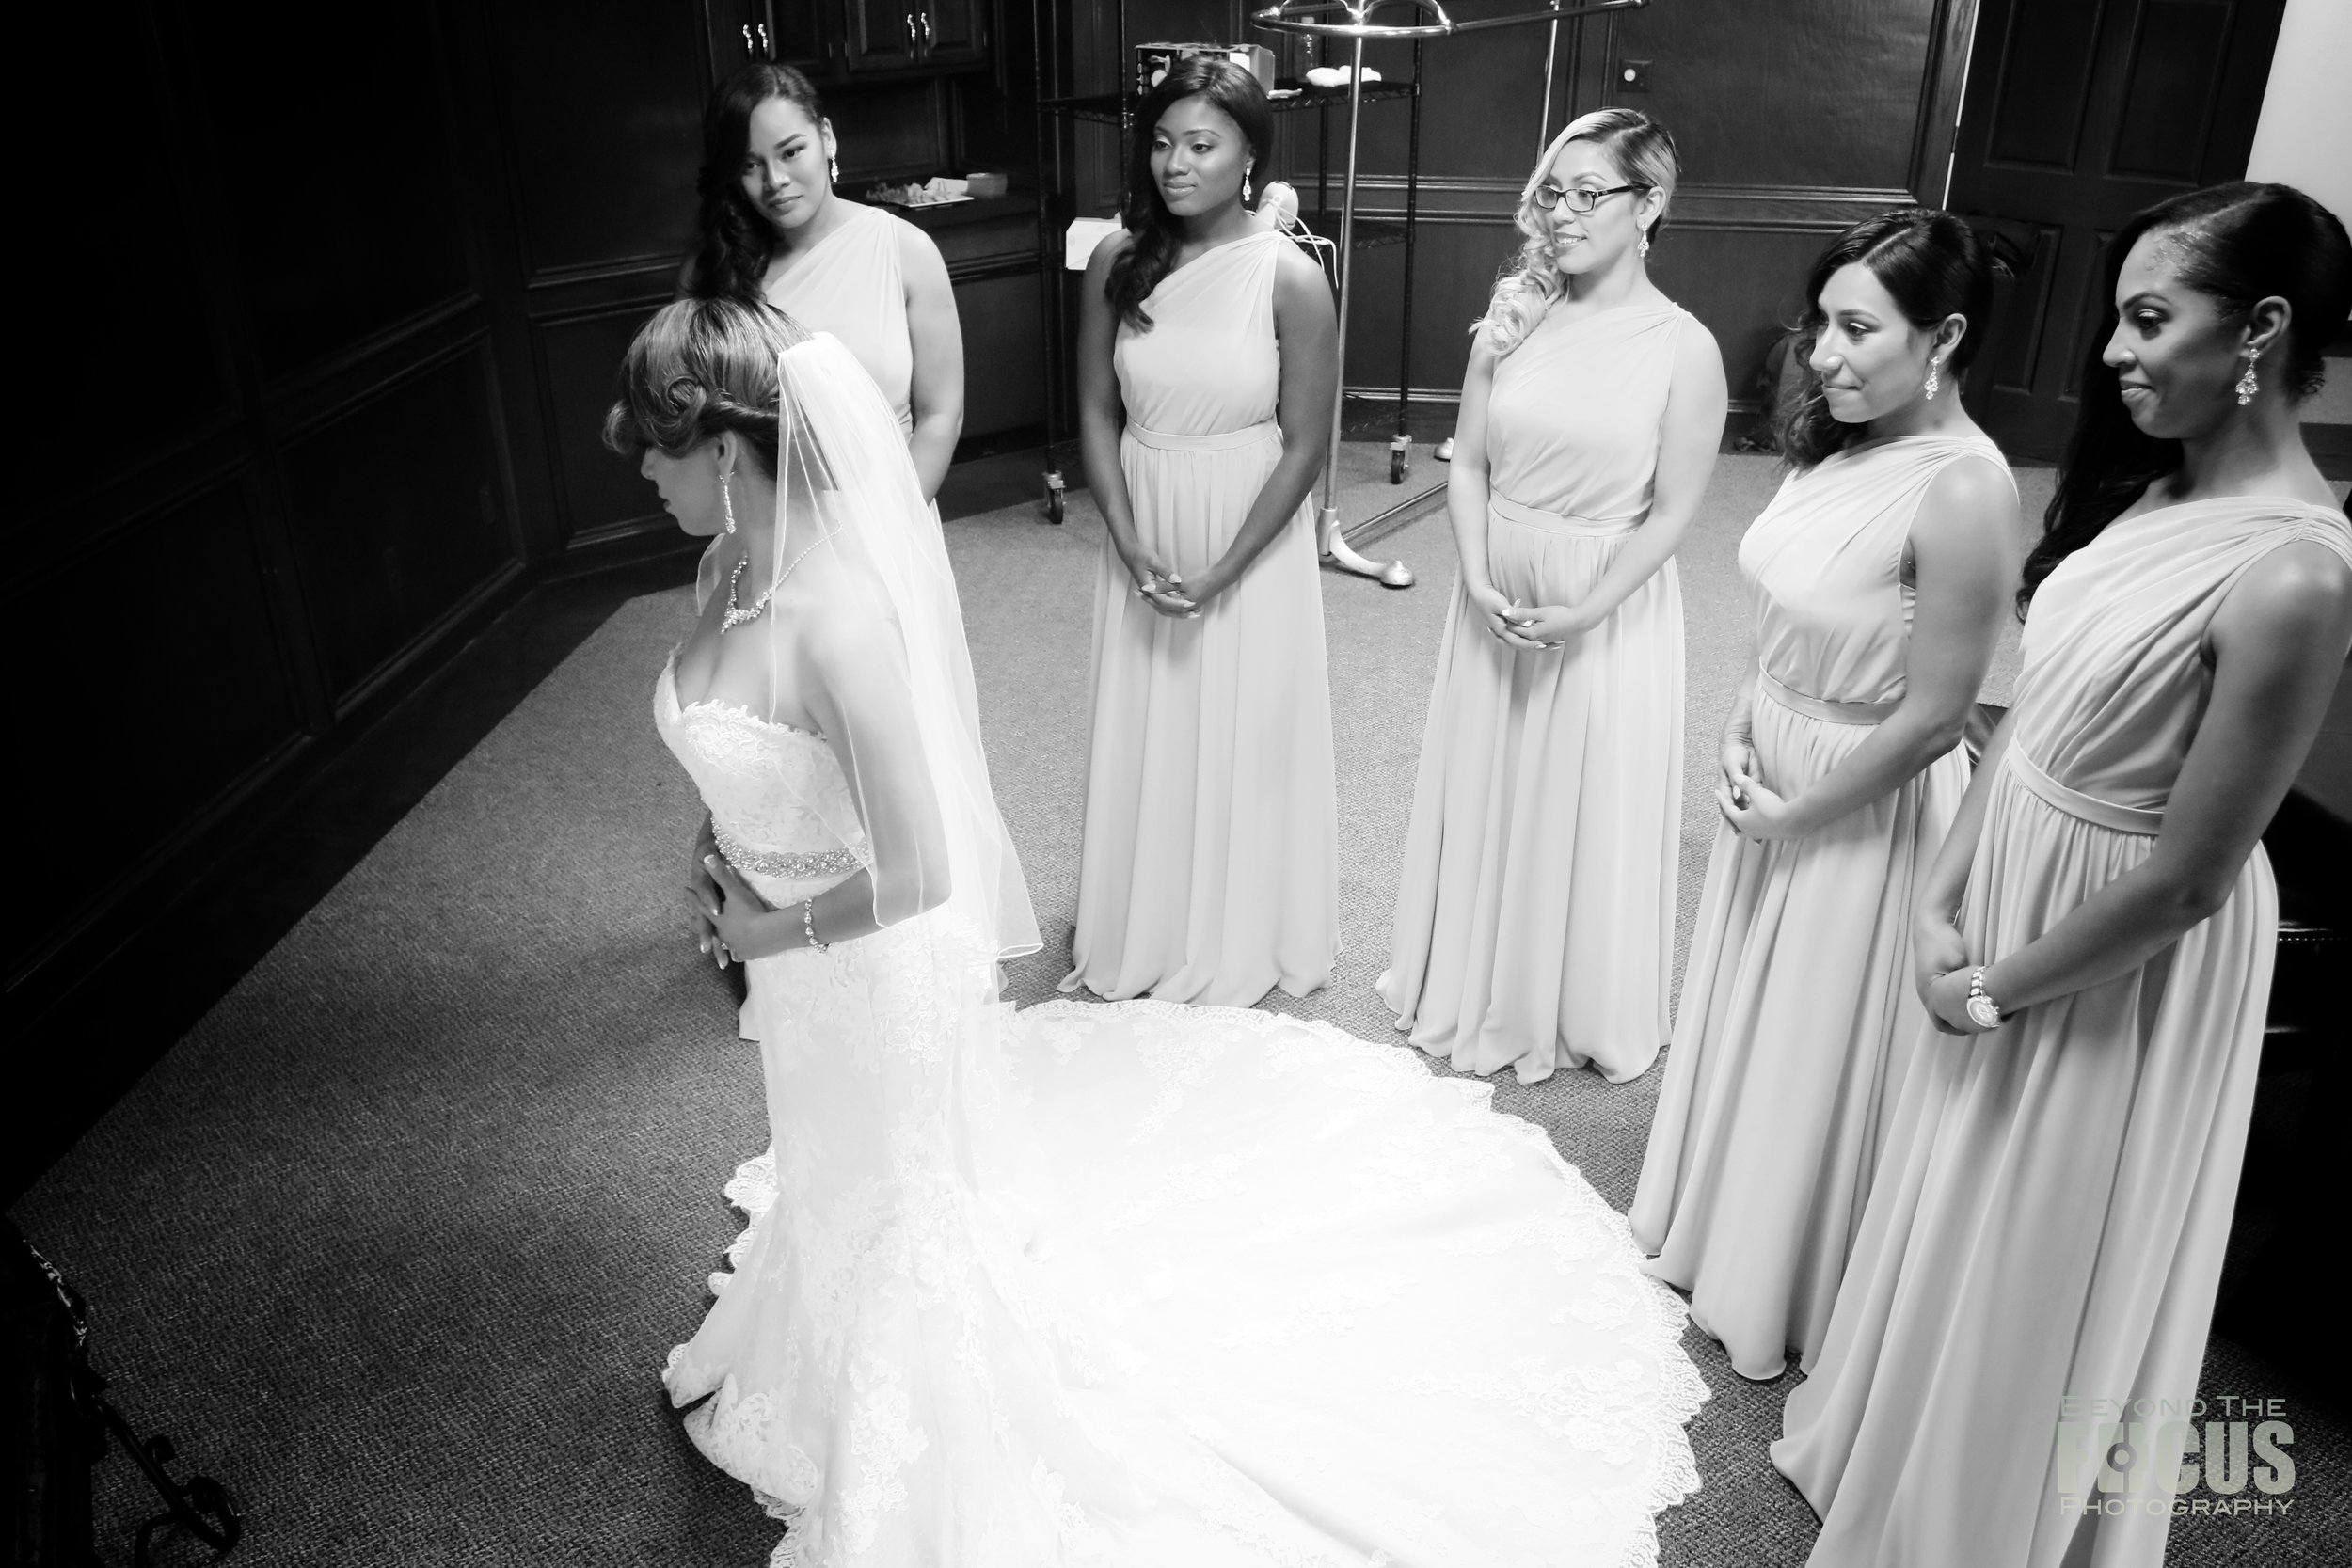 Palmer Wedding - Pre-Wedding Photos 26.jpg